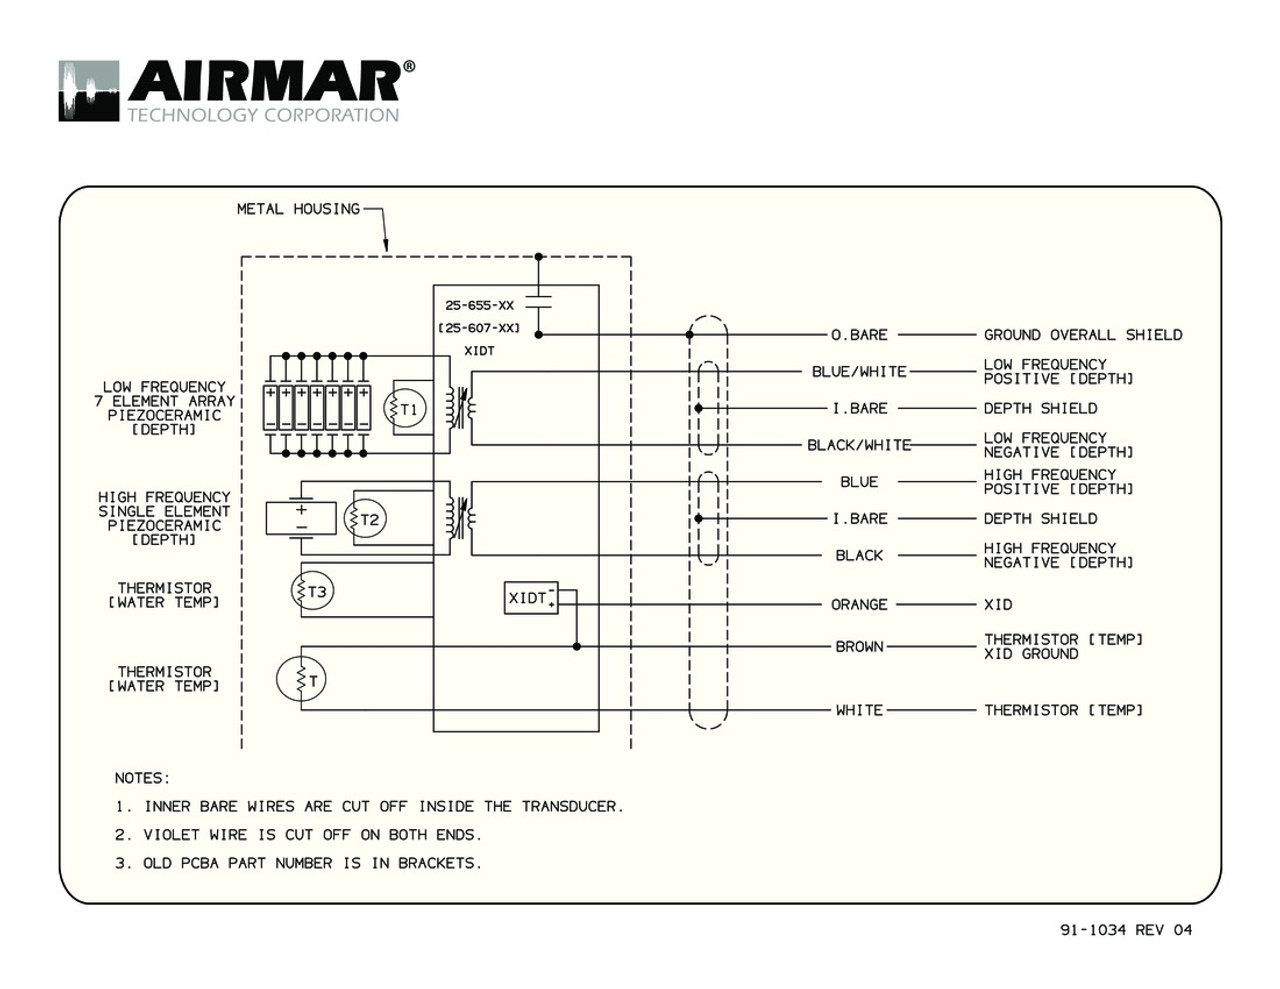 Lowrance Transducer Wiring Diagram - Wiring Diagram M6 on garmin gpsmap schematic diagrams service manuals, rei diagrams, delphi radio diagrams, garmin 7 pin wiring diagram, lowrance wiring diagrams,